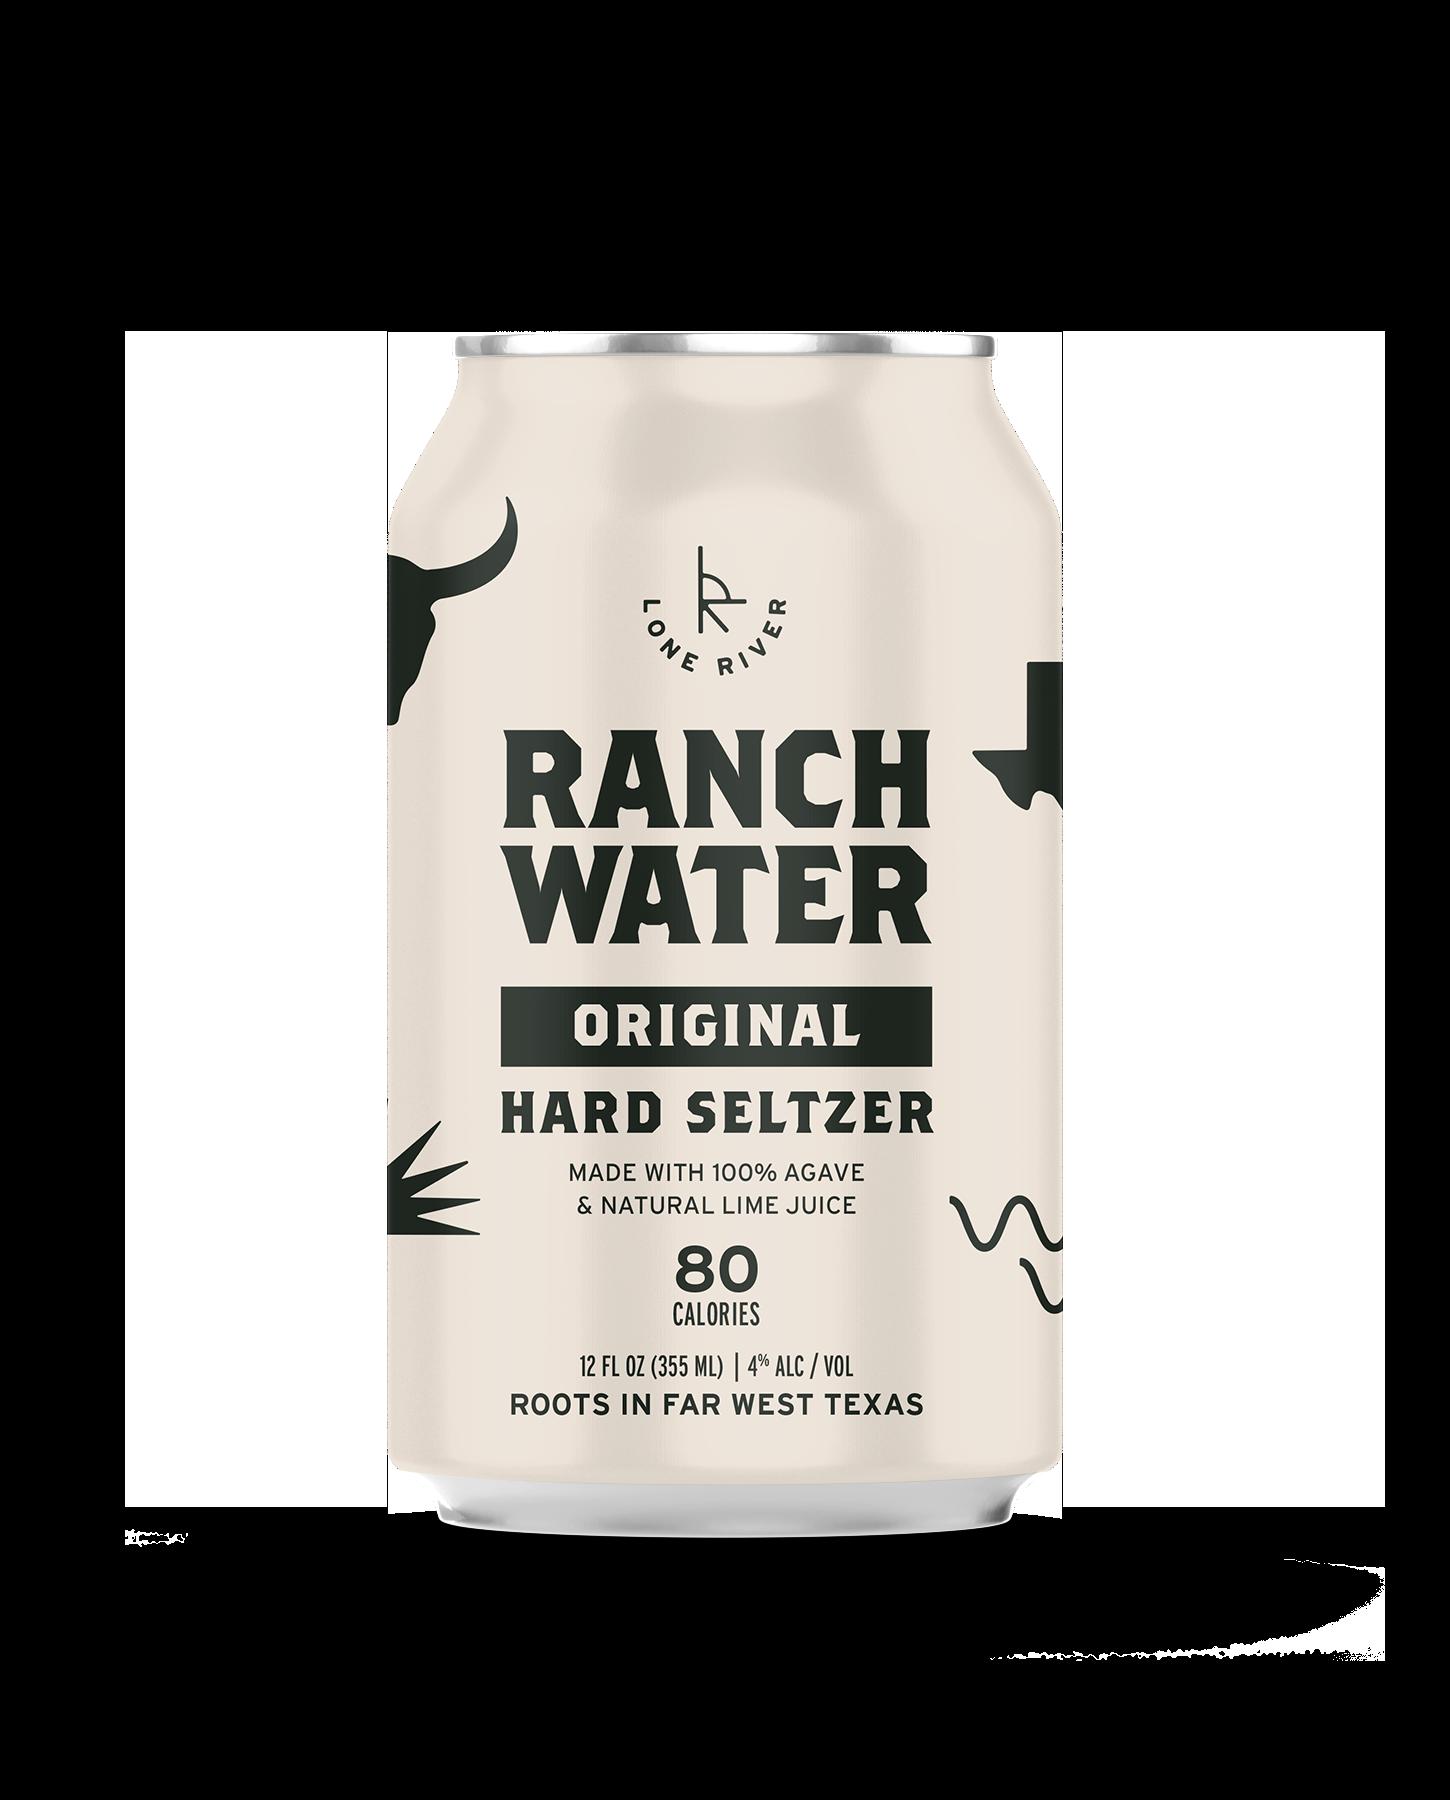 Original Ranch Water Hard Seltzer